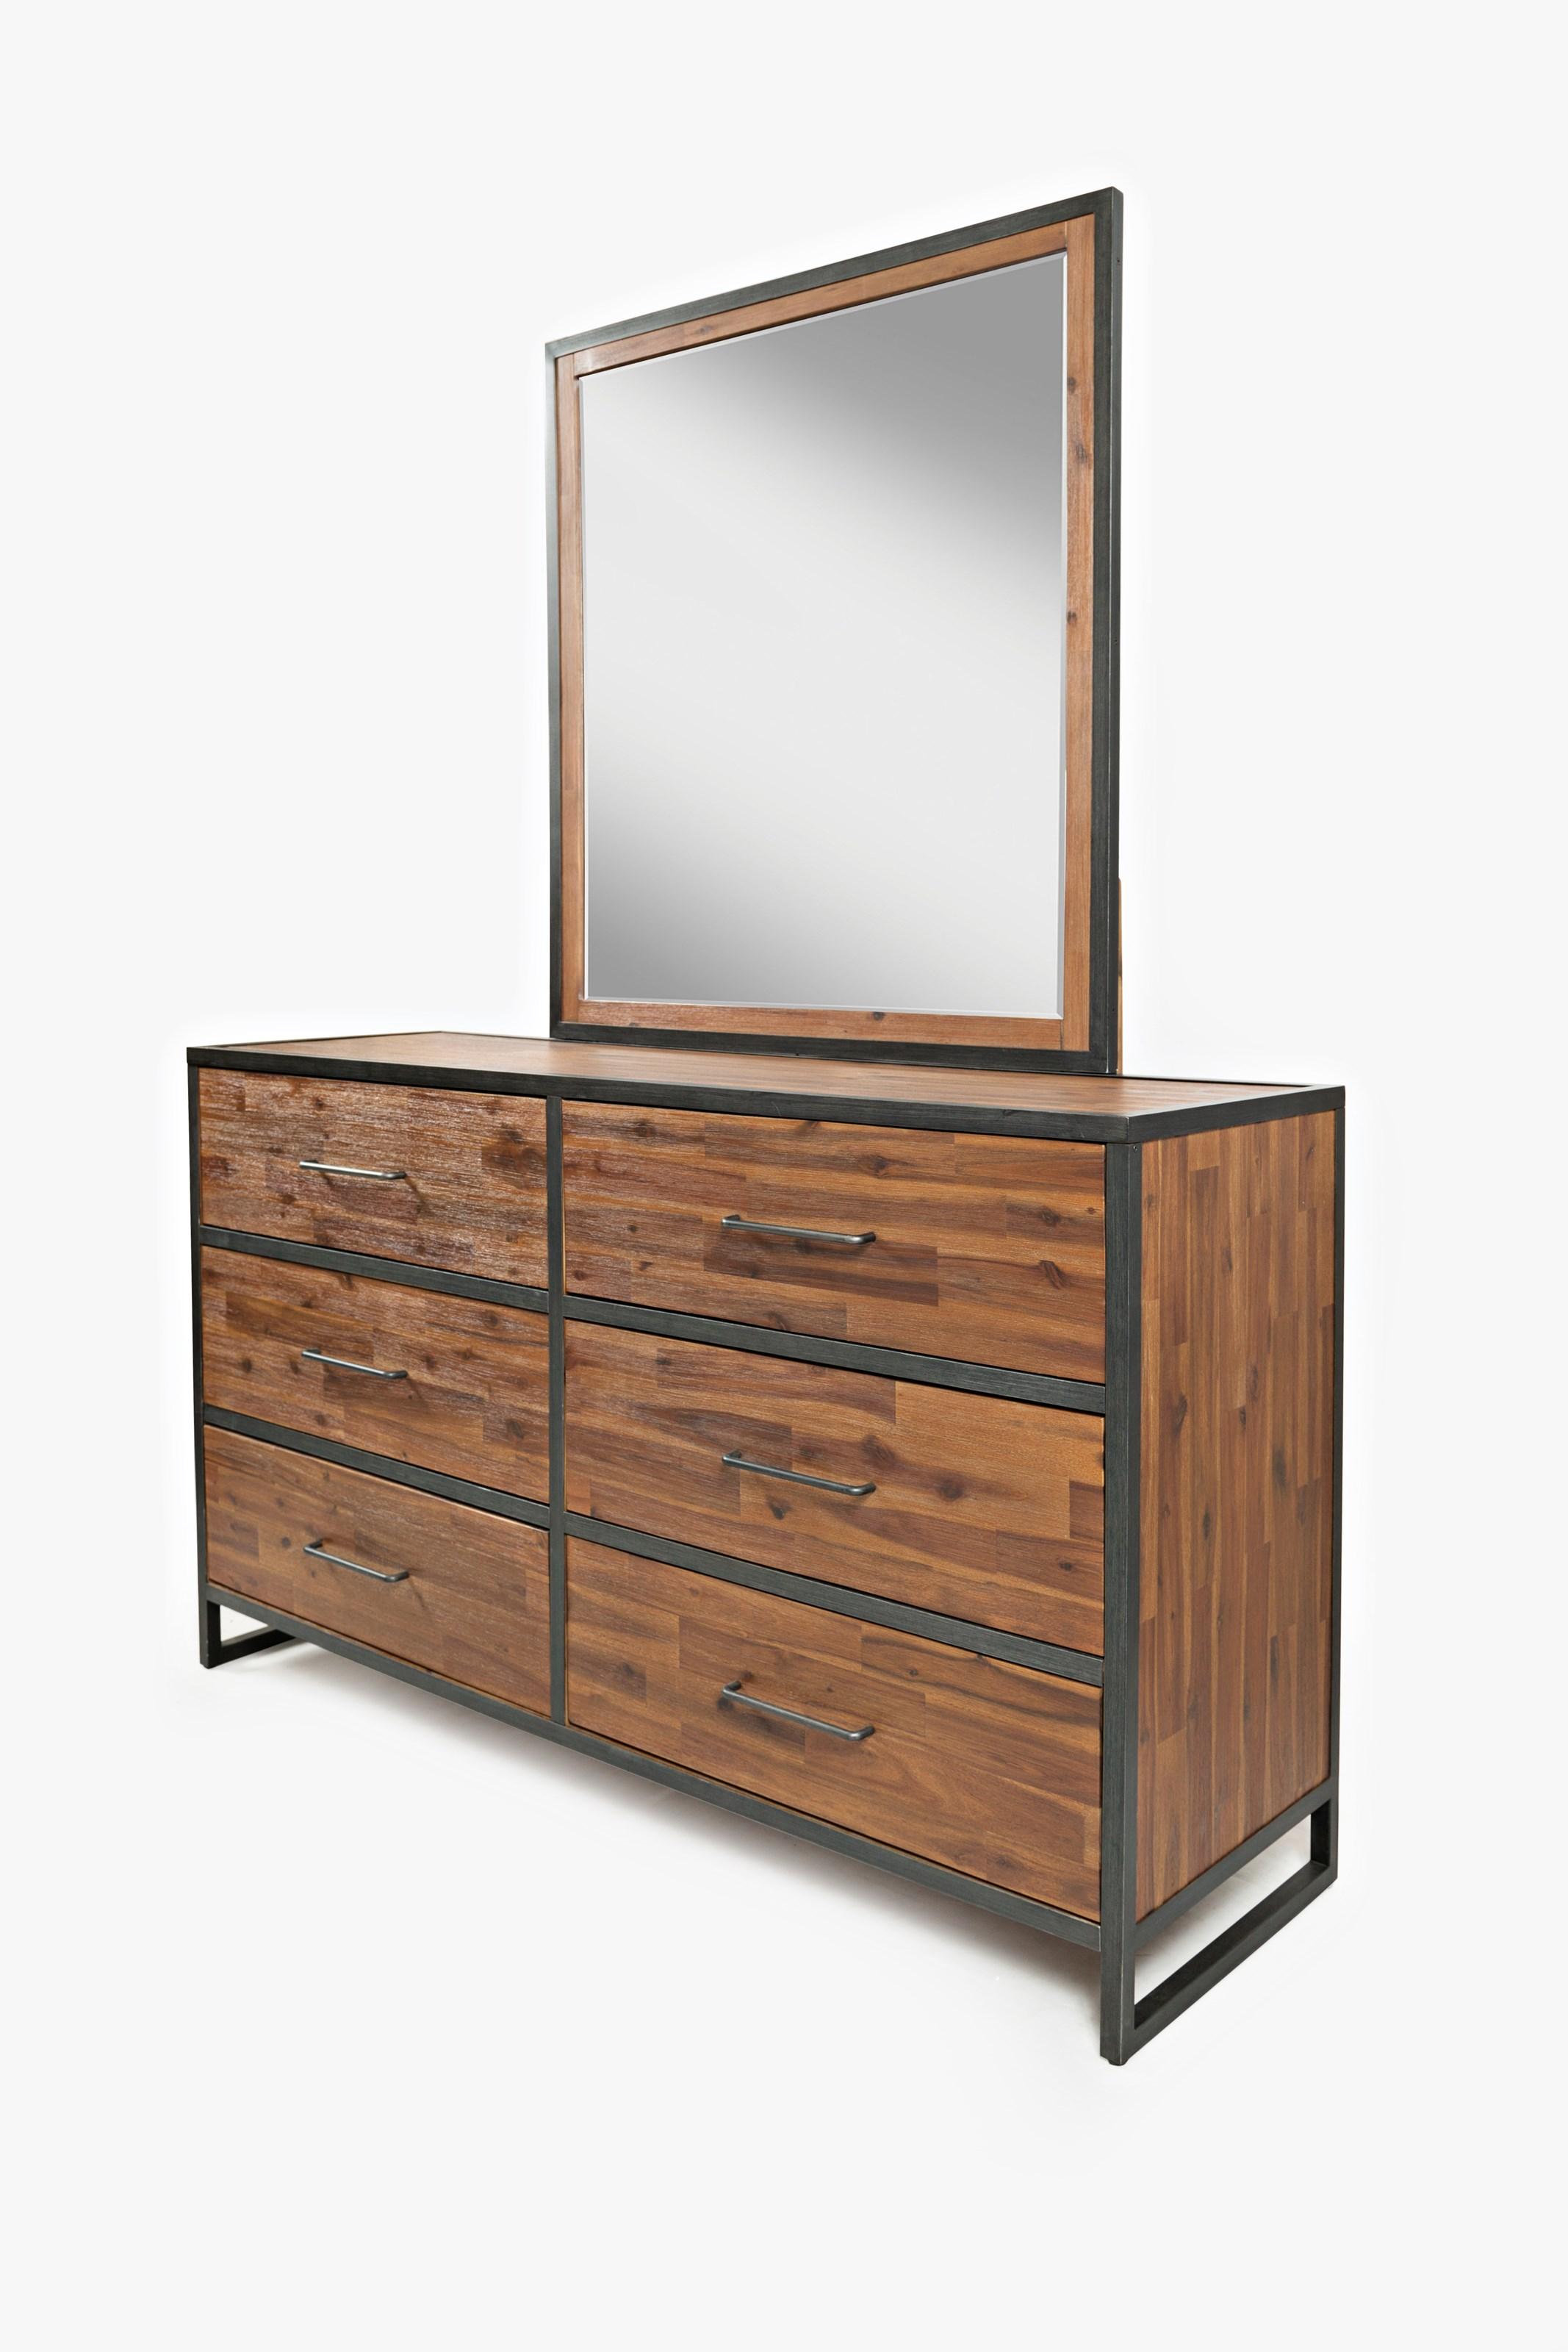 Sylvan mirror morris home dresser mirrors for Morris home